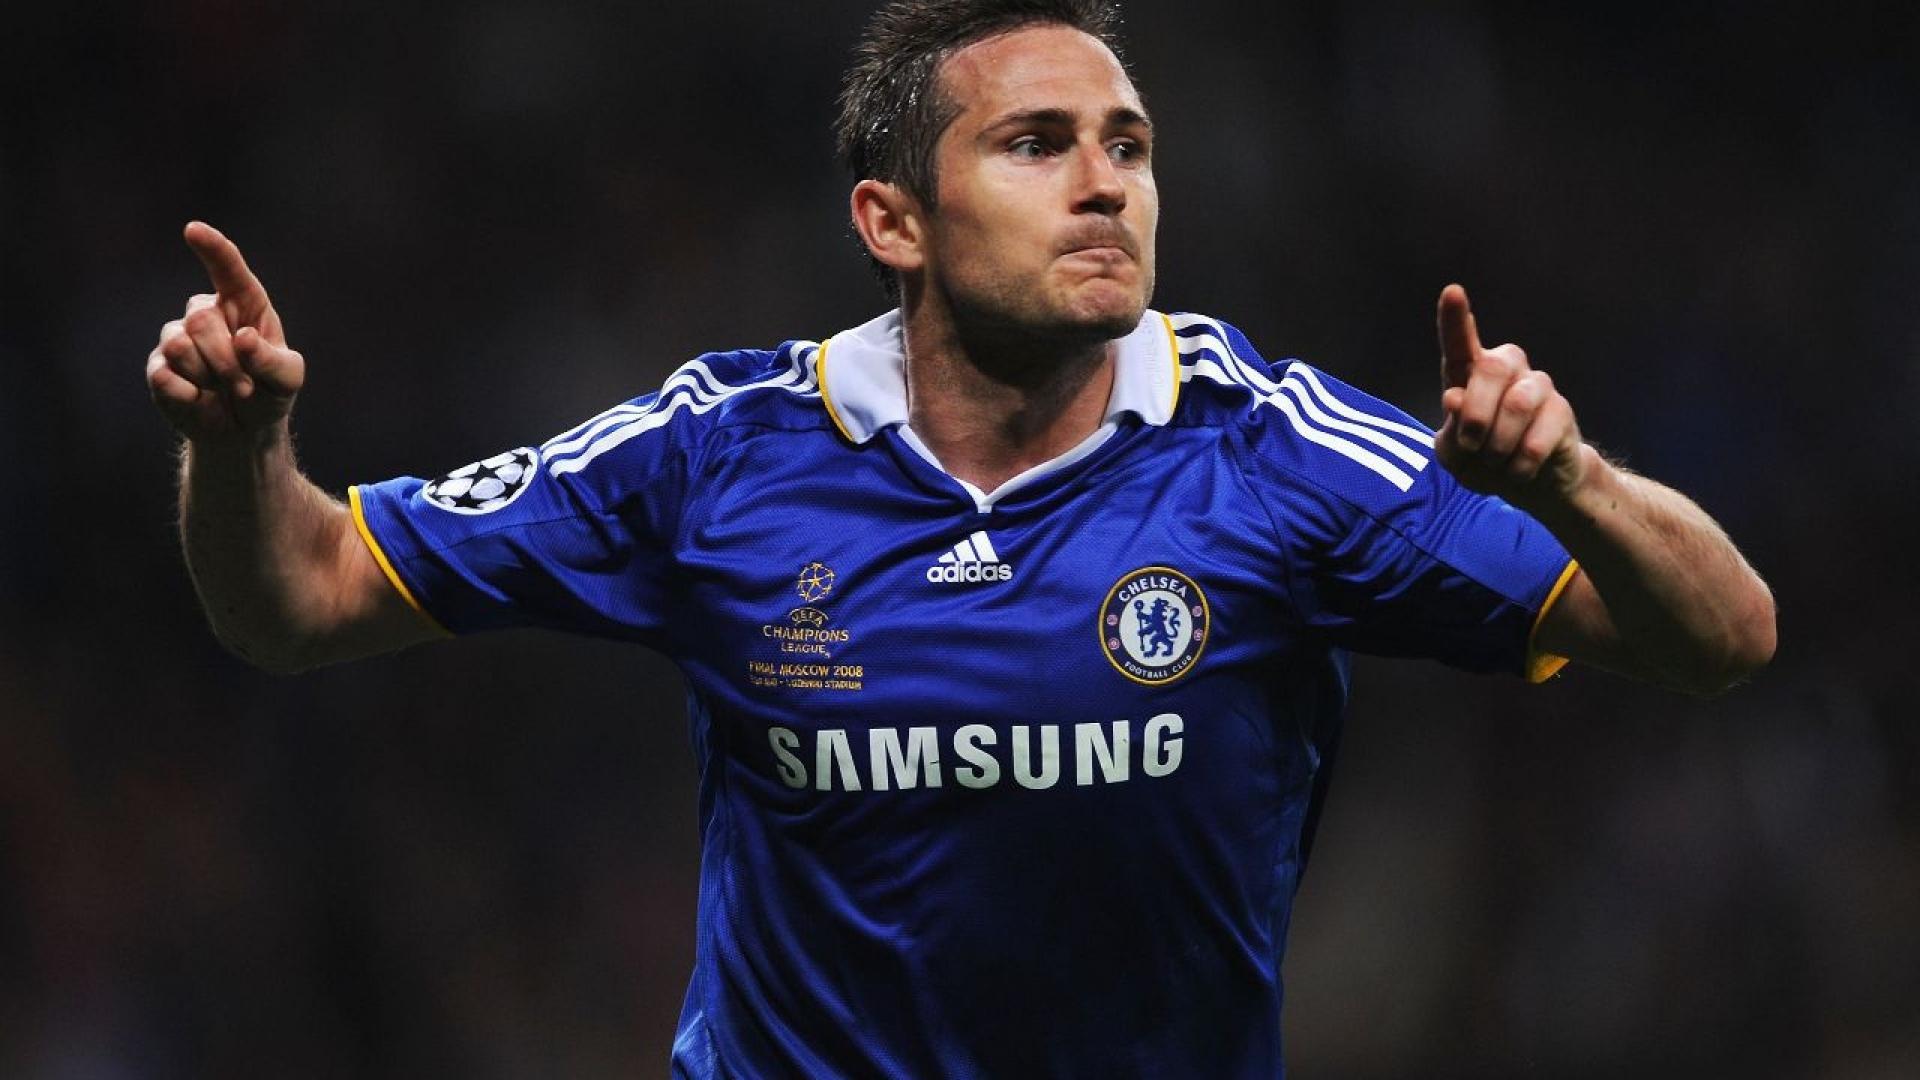 Frank Lampard Hd